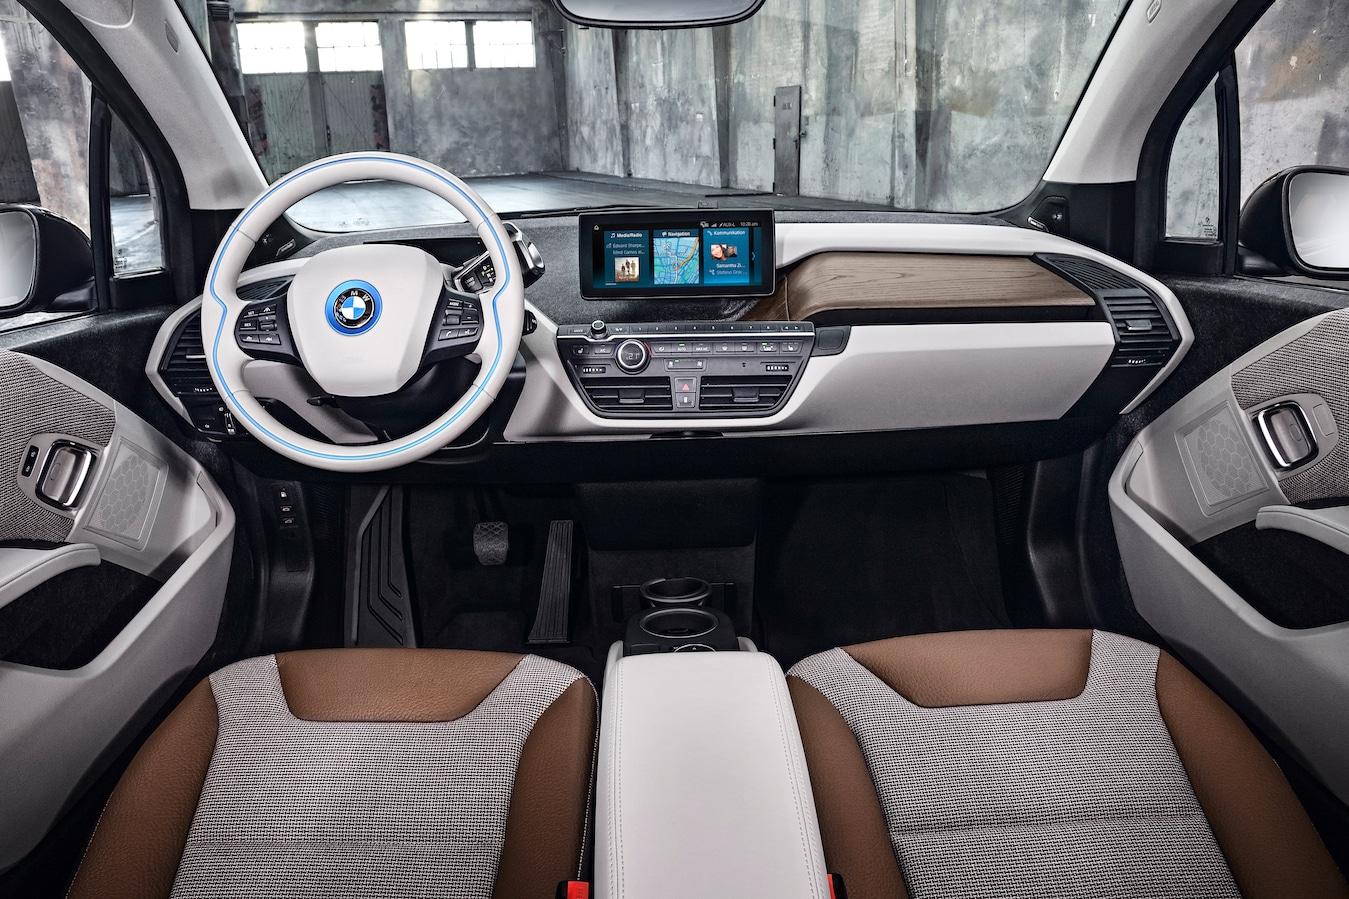 BMW i3 Intrior Details